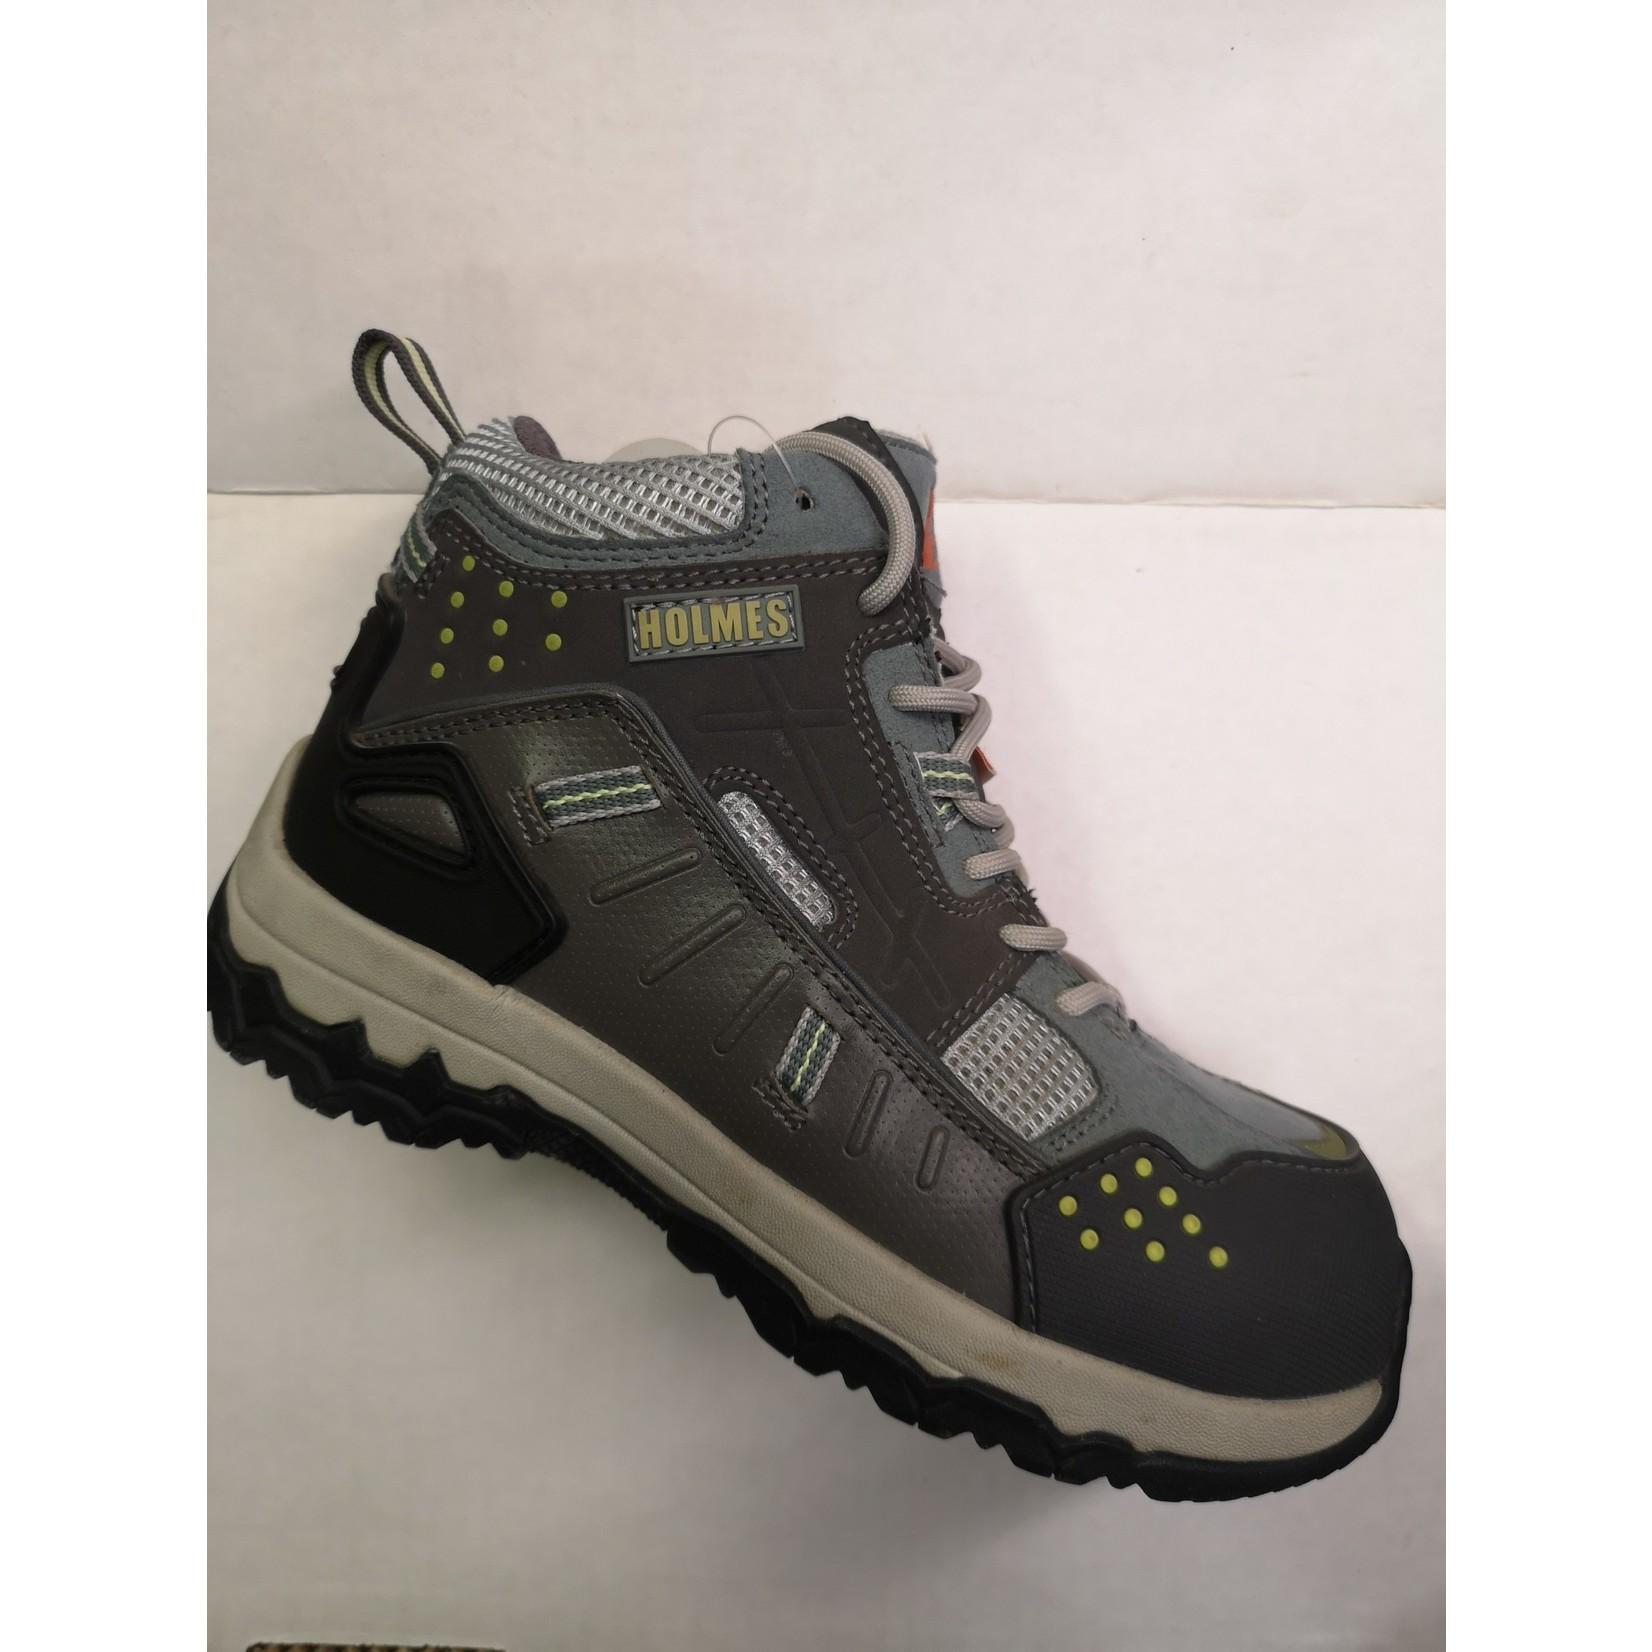 Mike Holmes Oltenian CSA Women's Shoe size 6